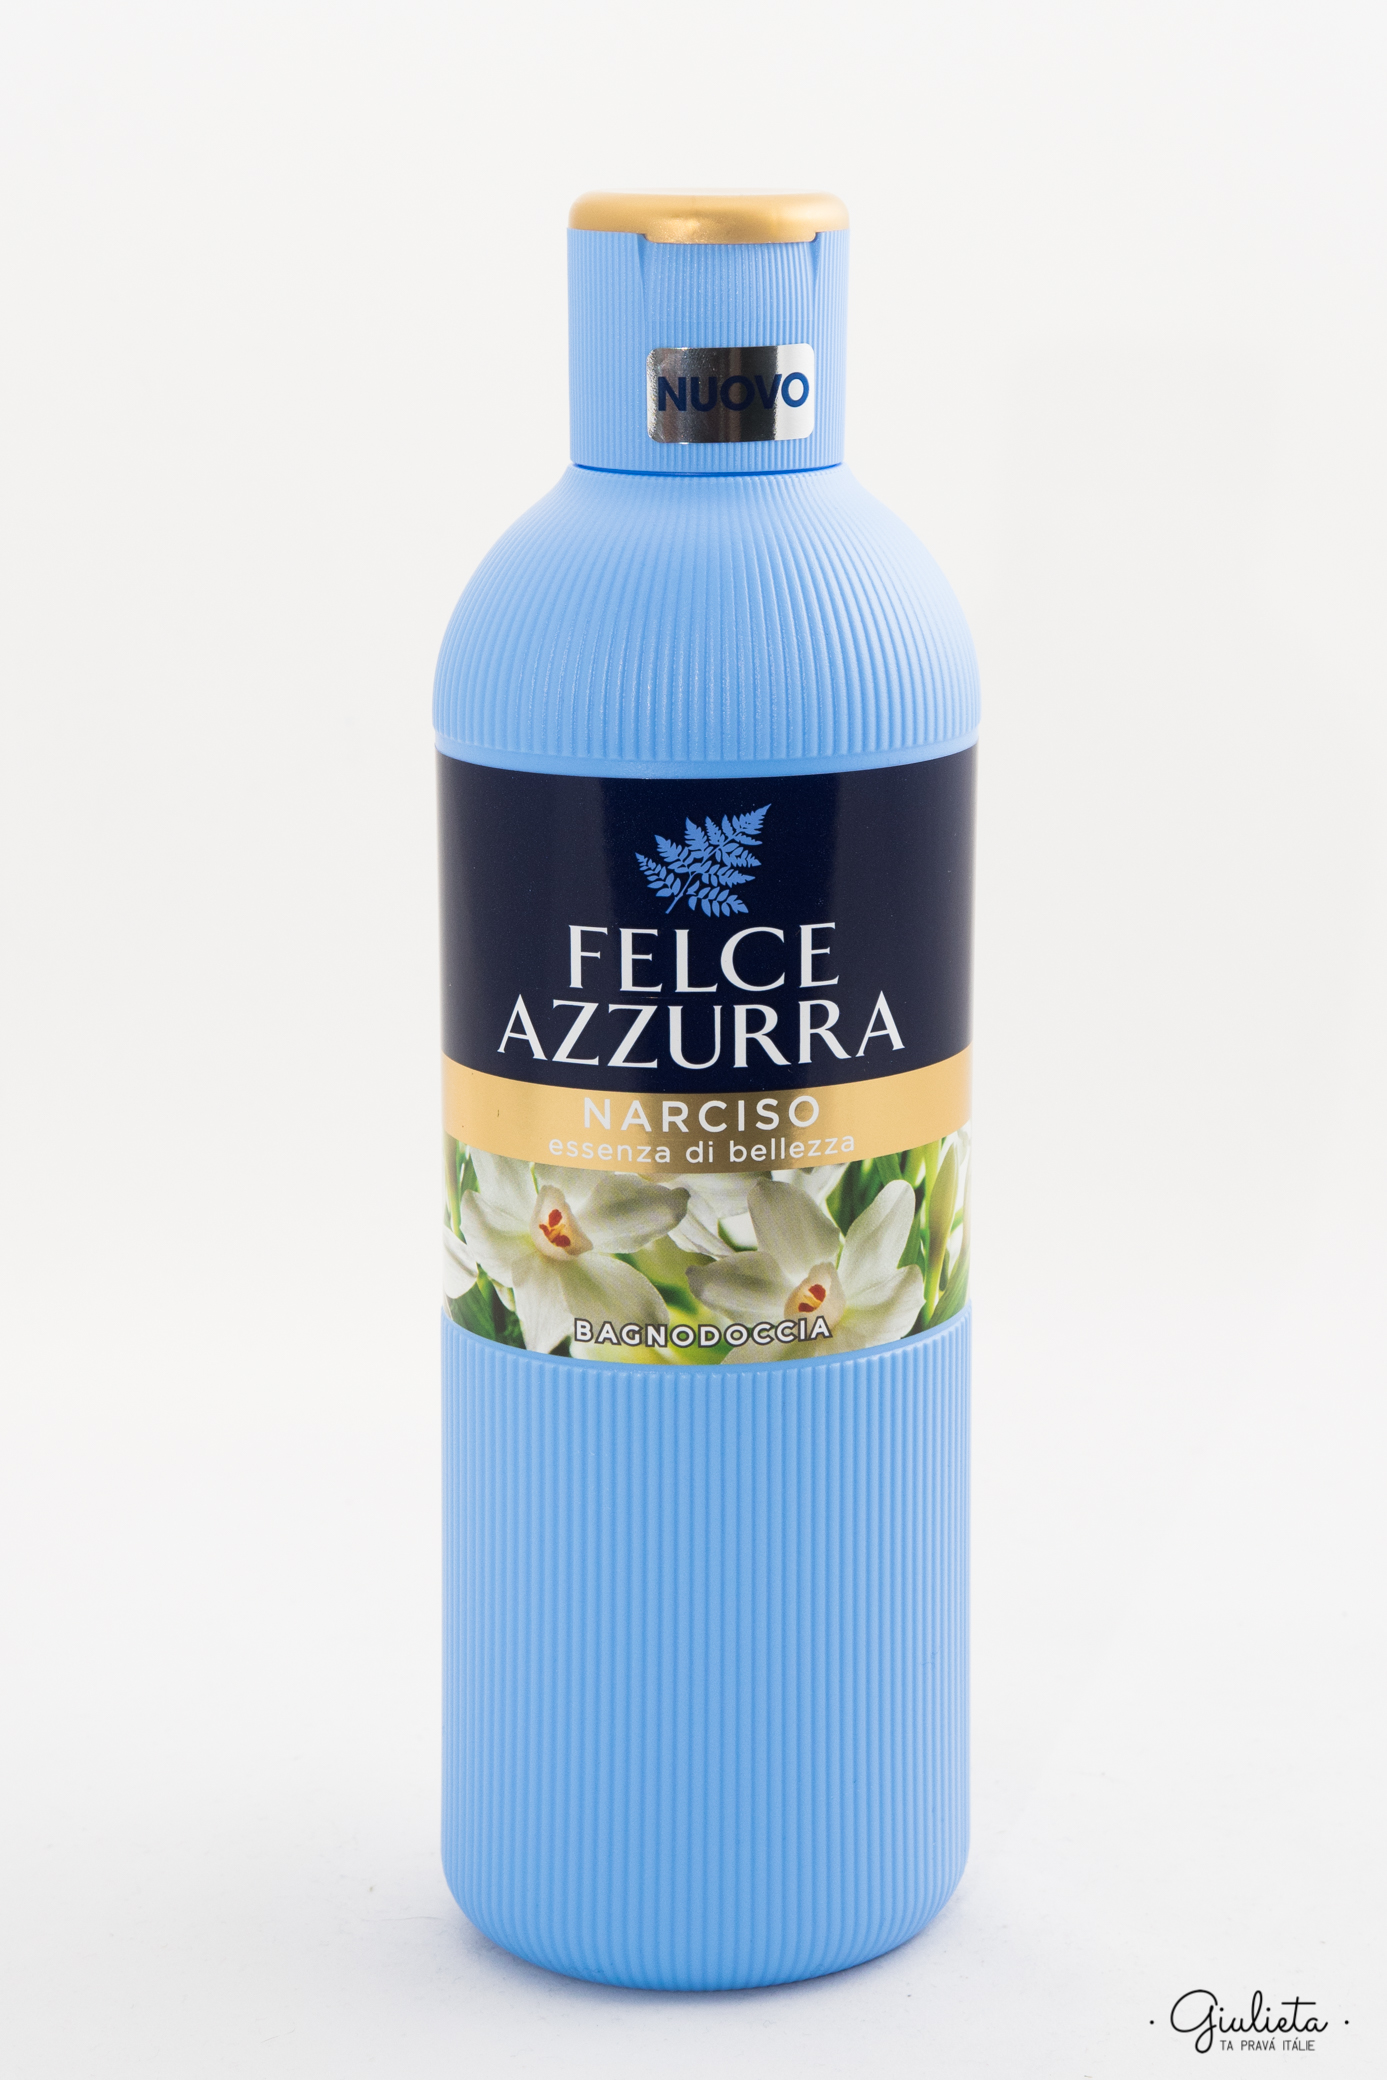 Felce Azzurra sprchový gel/pěna do koupele Narciso, 650 ml